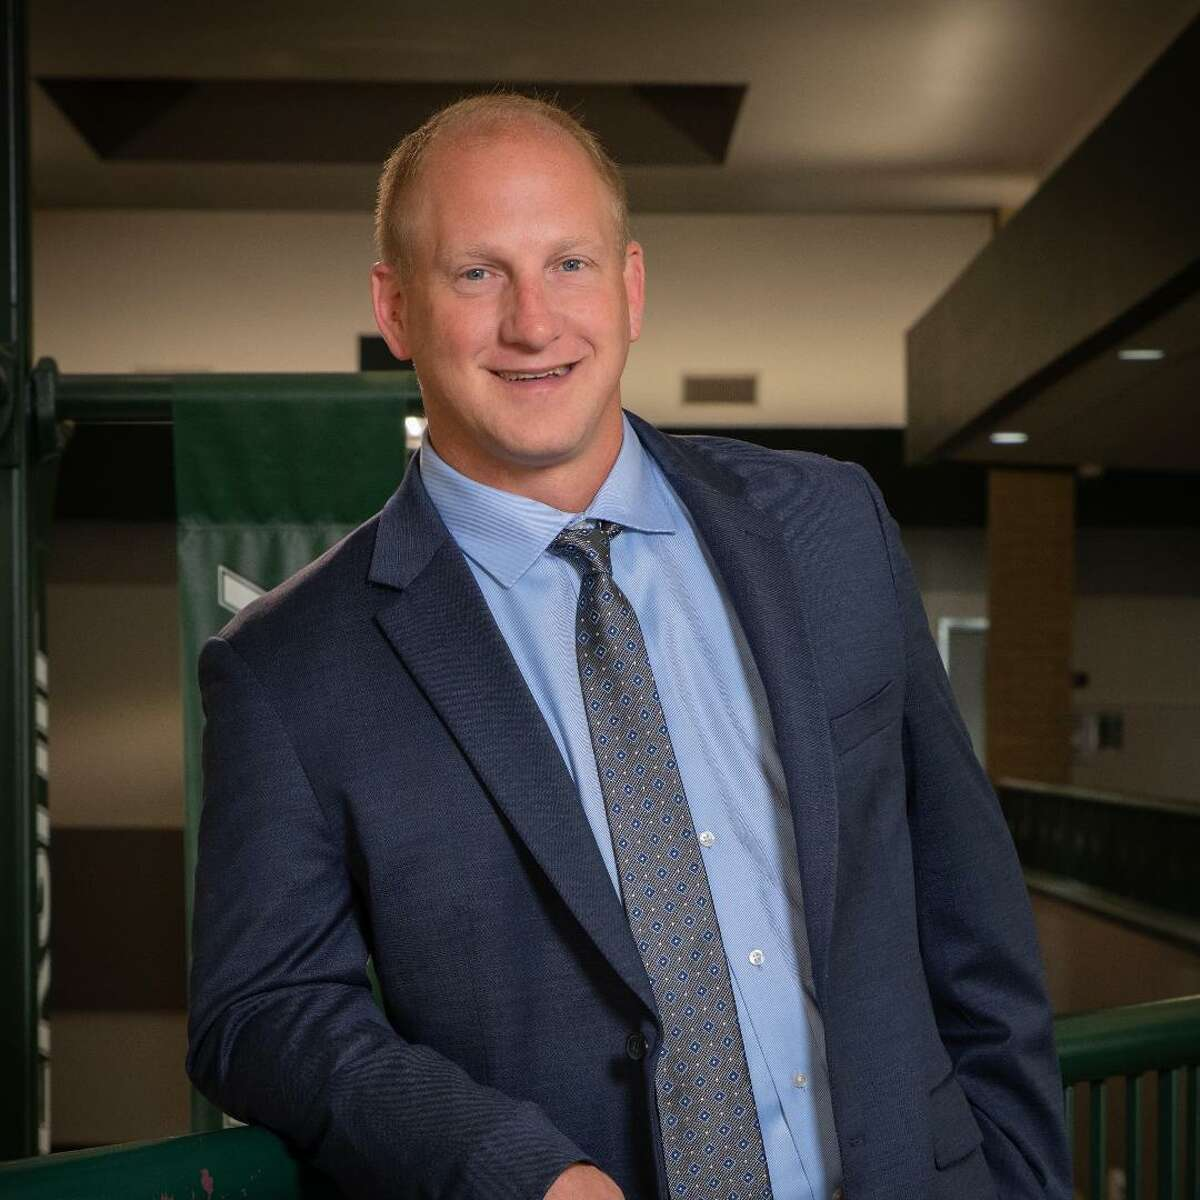 Longtime Lutheran South Academy athletic director Rob Psencik has accepted a similar position at a public school in Nebraska.